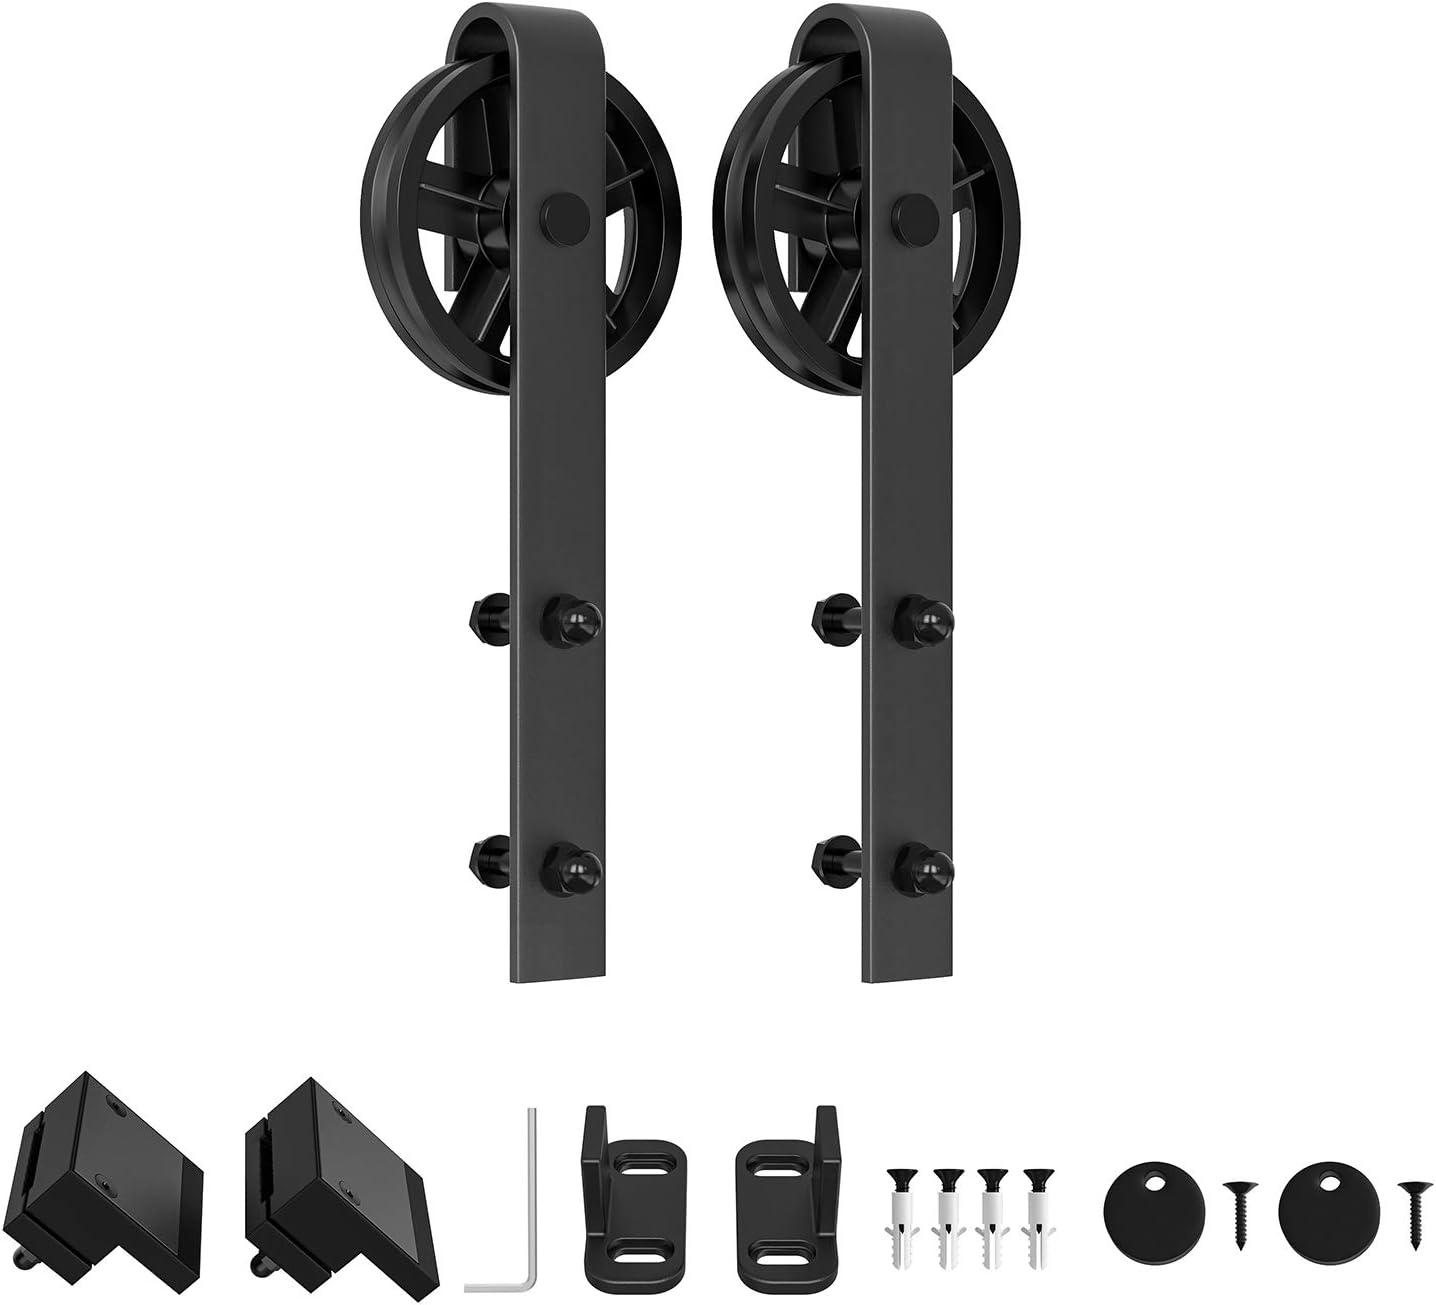 WINSOON Sliding Barn Surprise price Door Max 79% OFF Hardware Spoke 2pcs Hangers Big Black